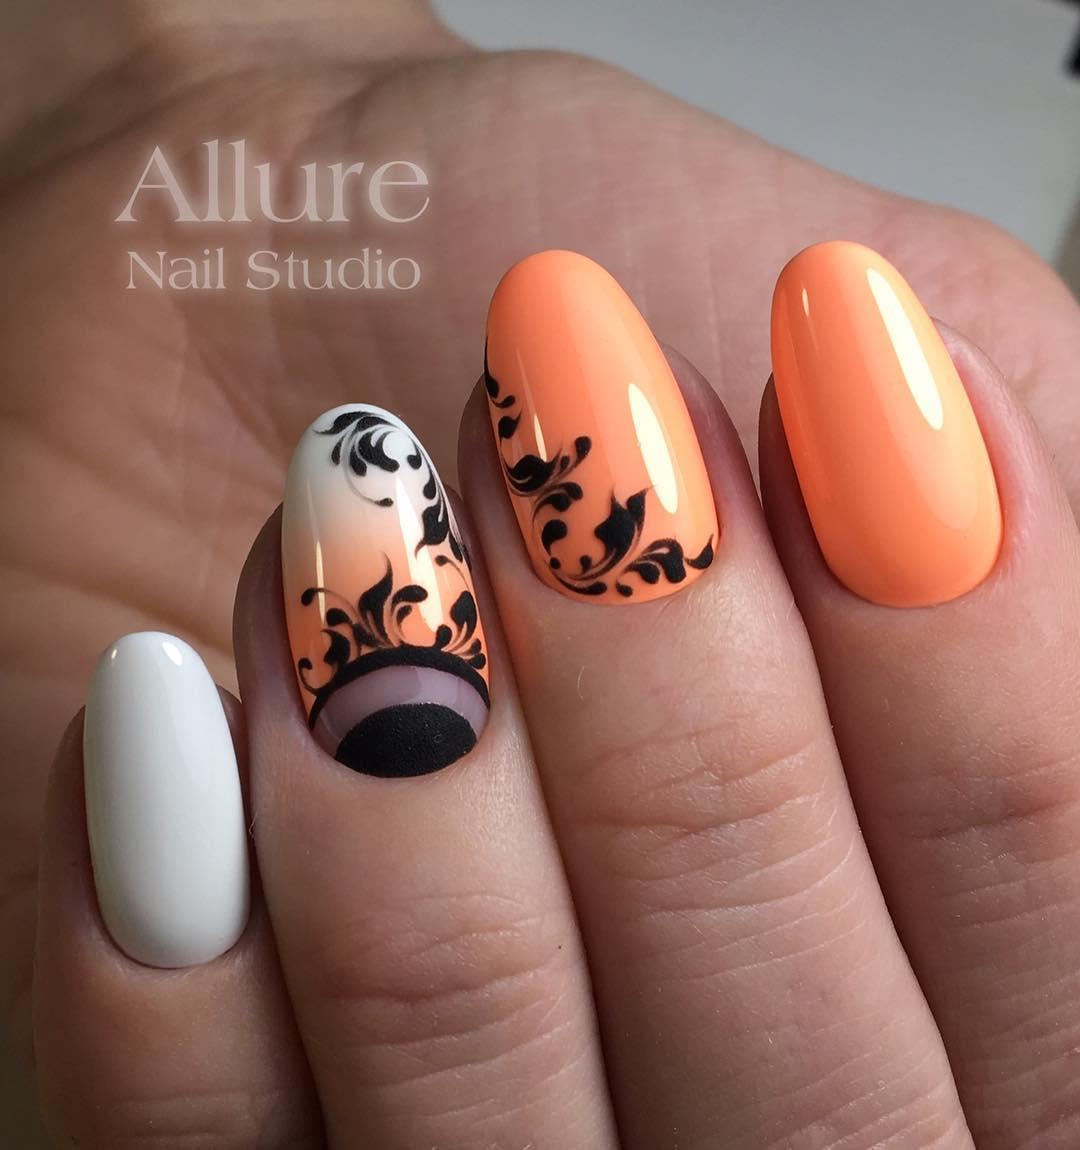 allure_nail_studio-3-копия.jpg